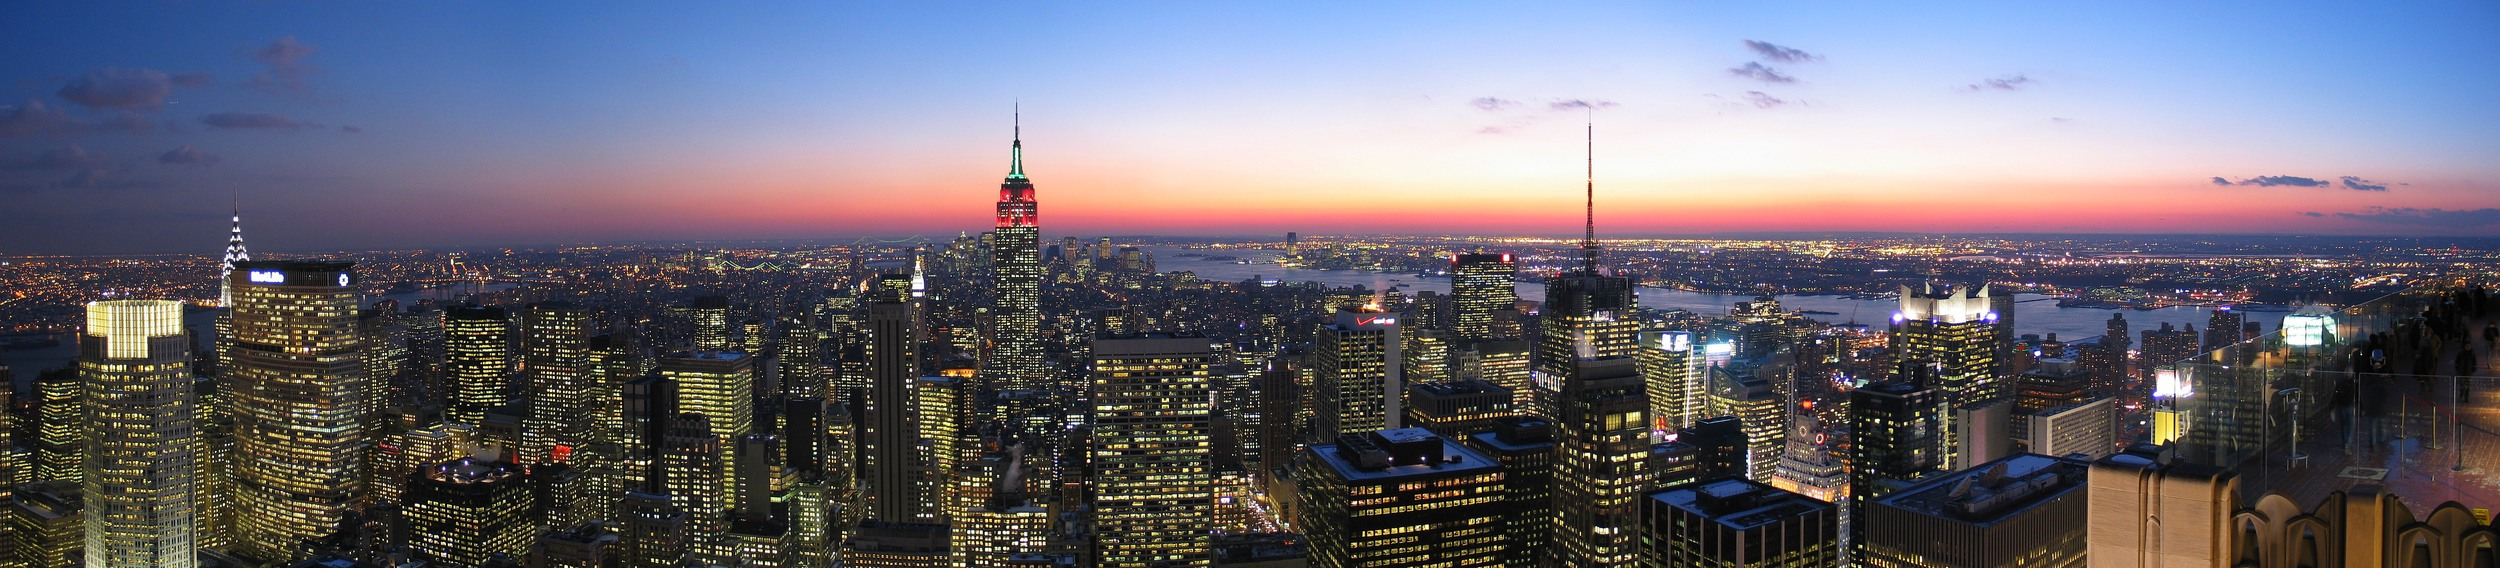 The iconic skyline. Photograph by Daniel Schwen.